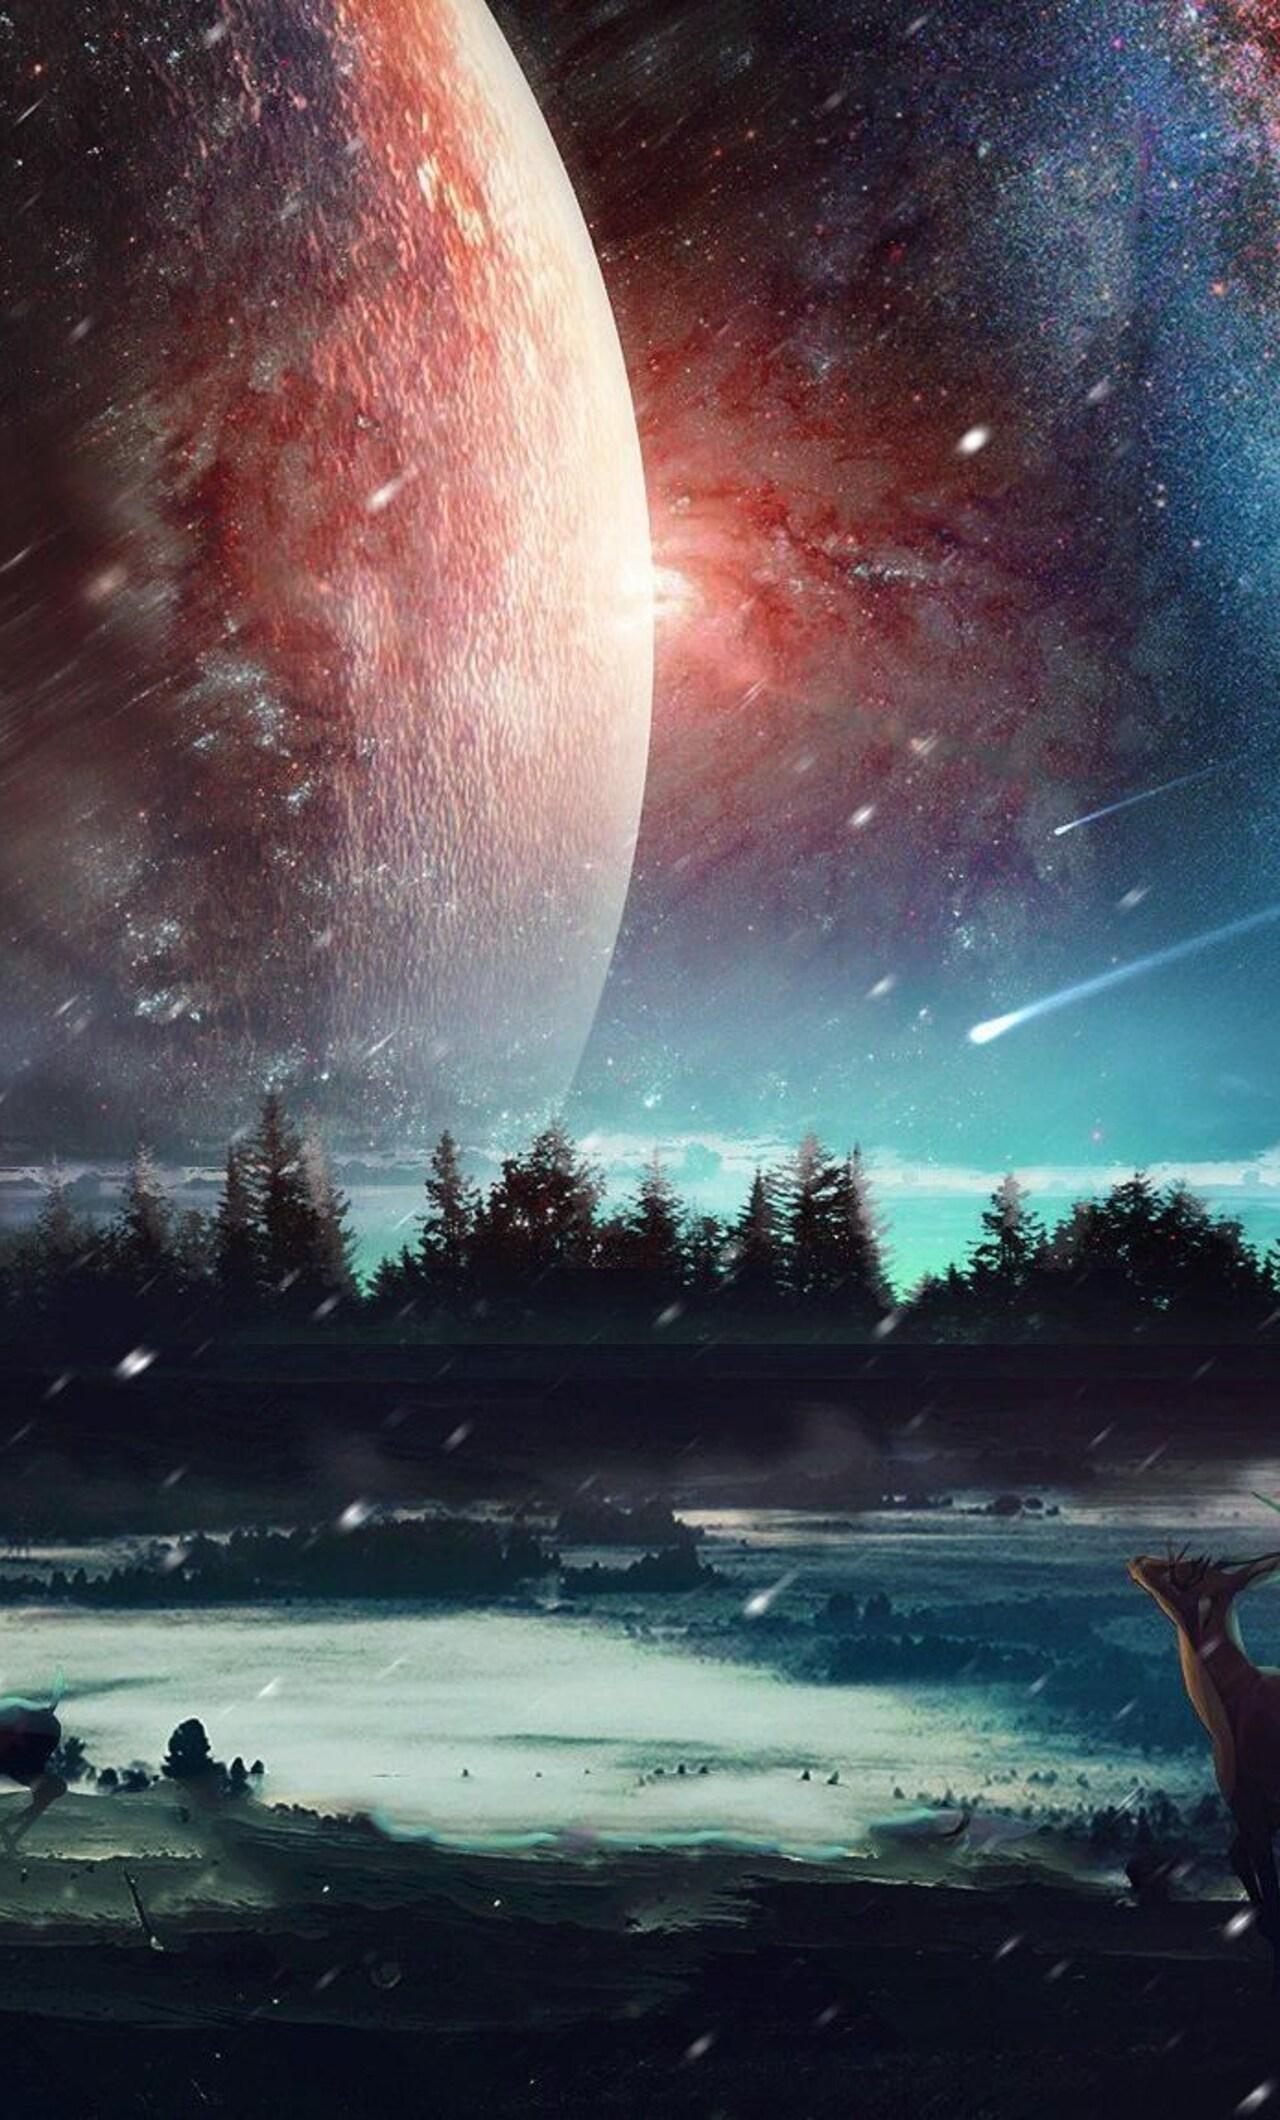 universe-scenery-hd.jpg